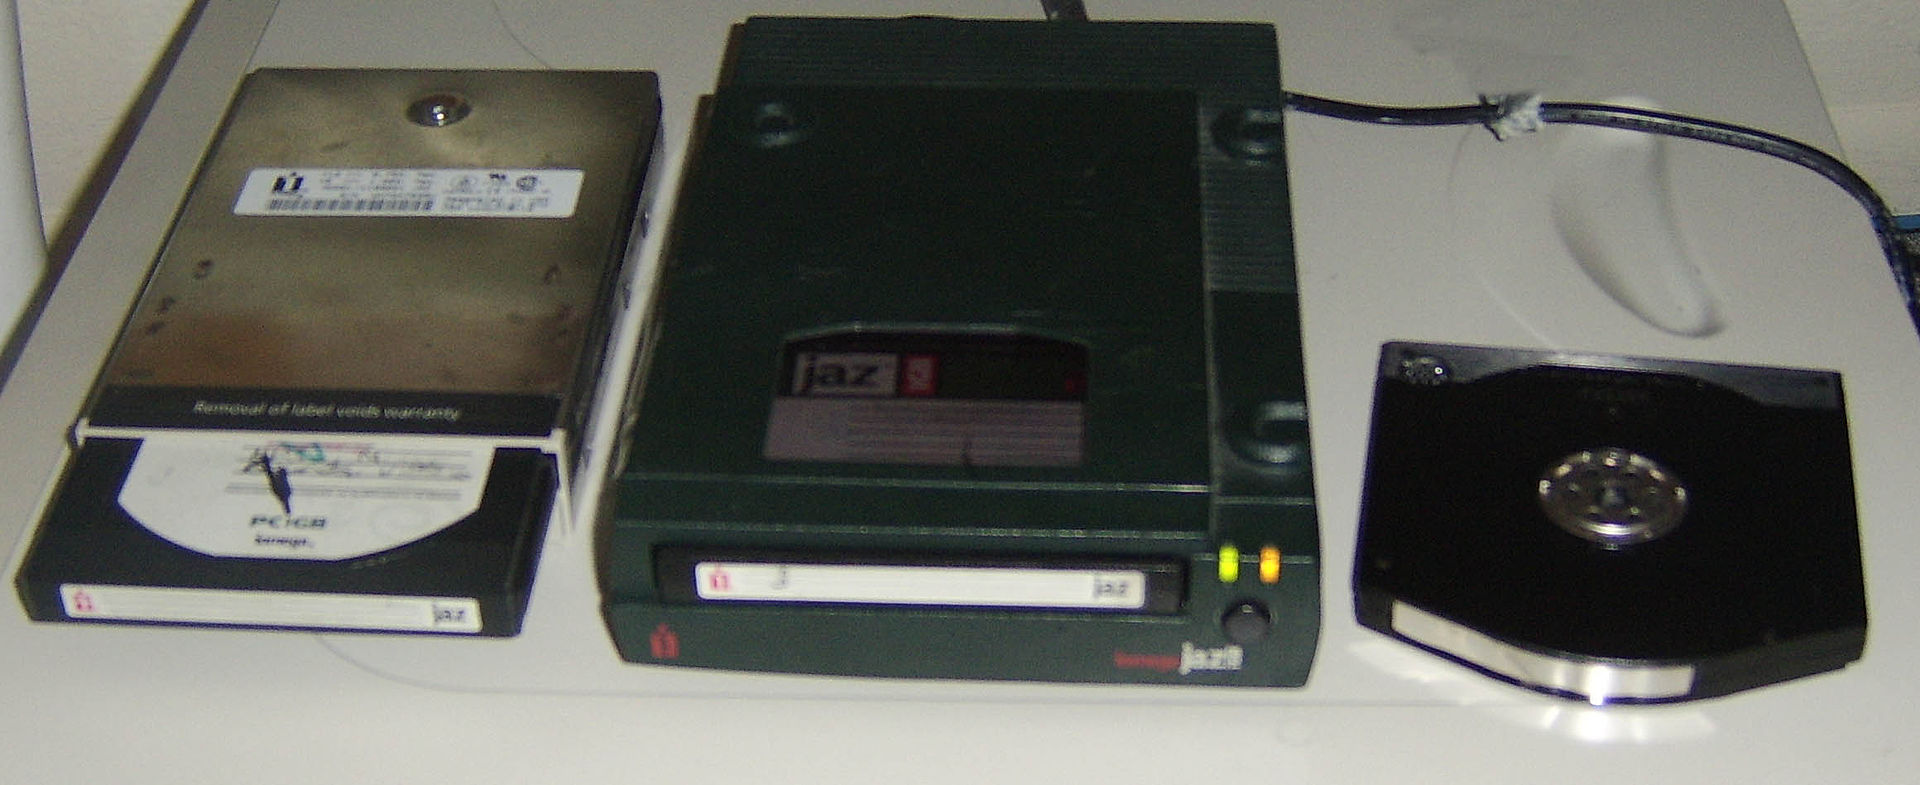 Jaz drive - Wikipedia